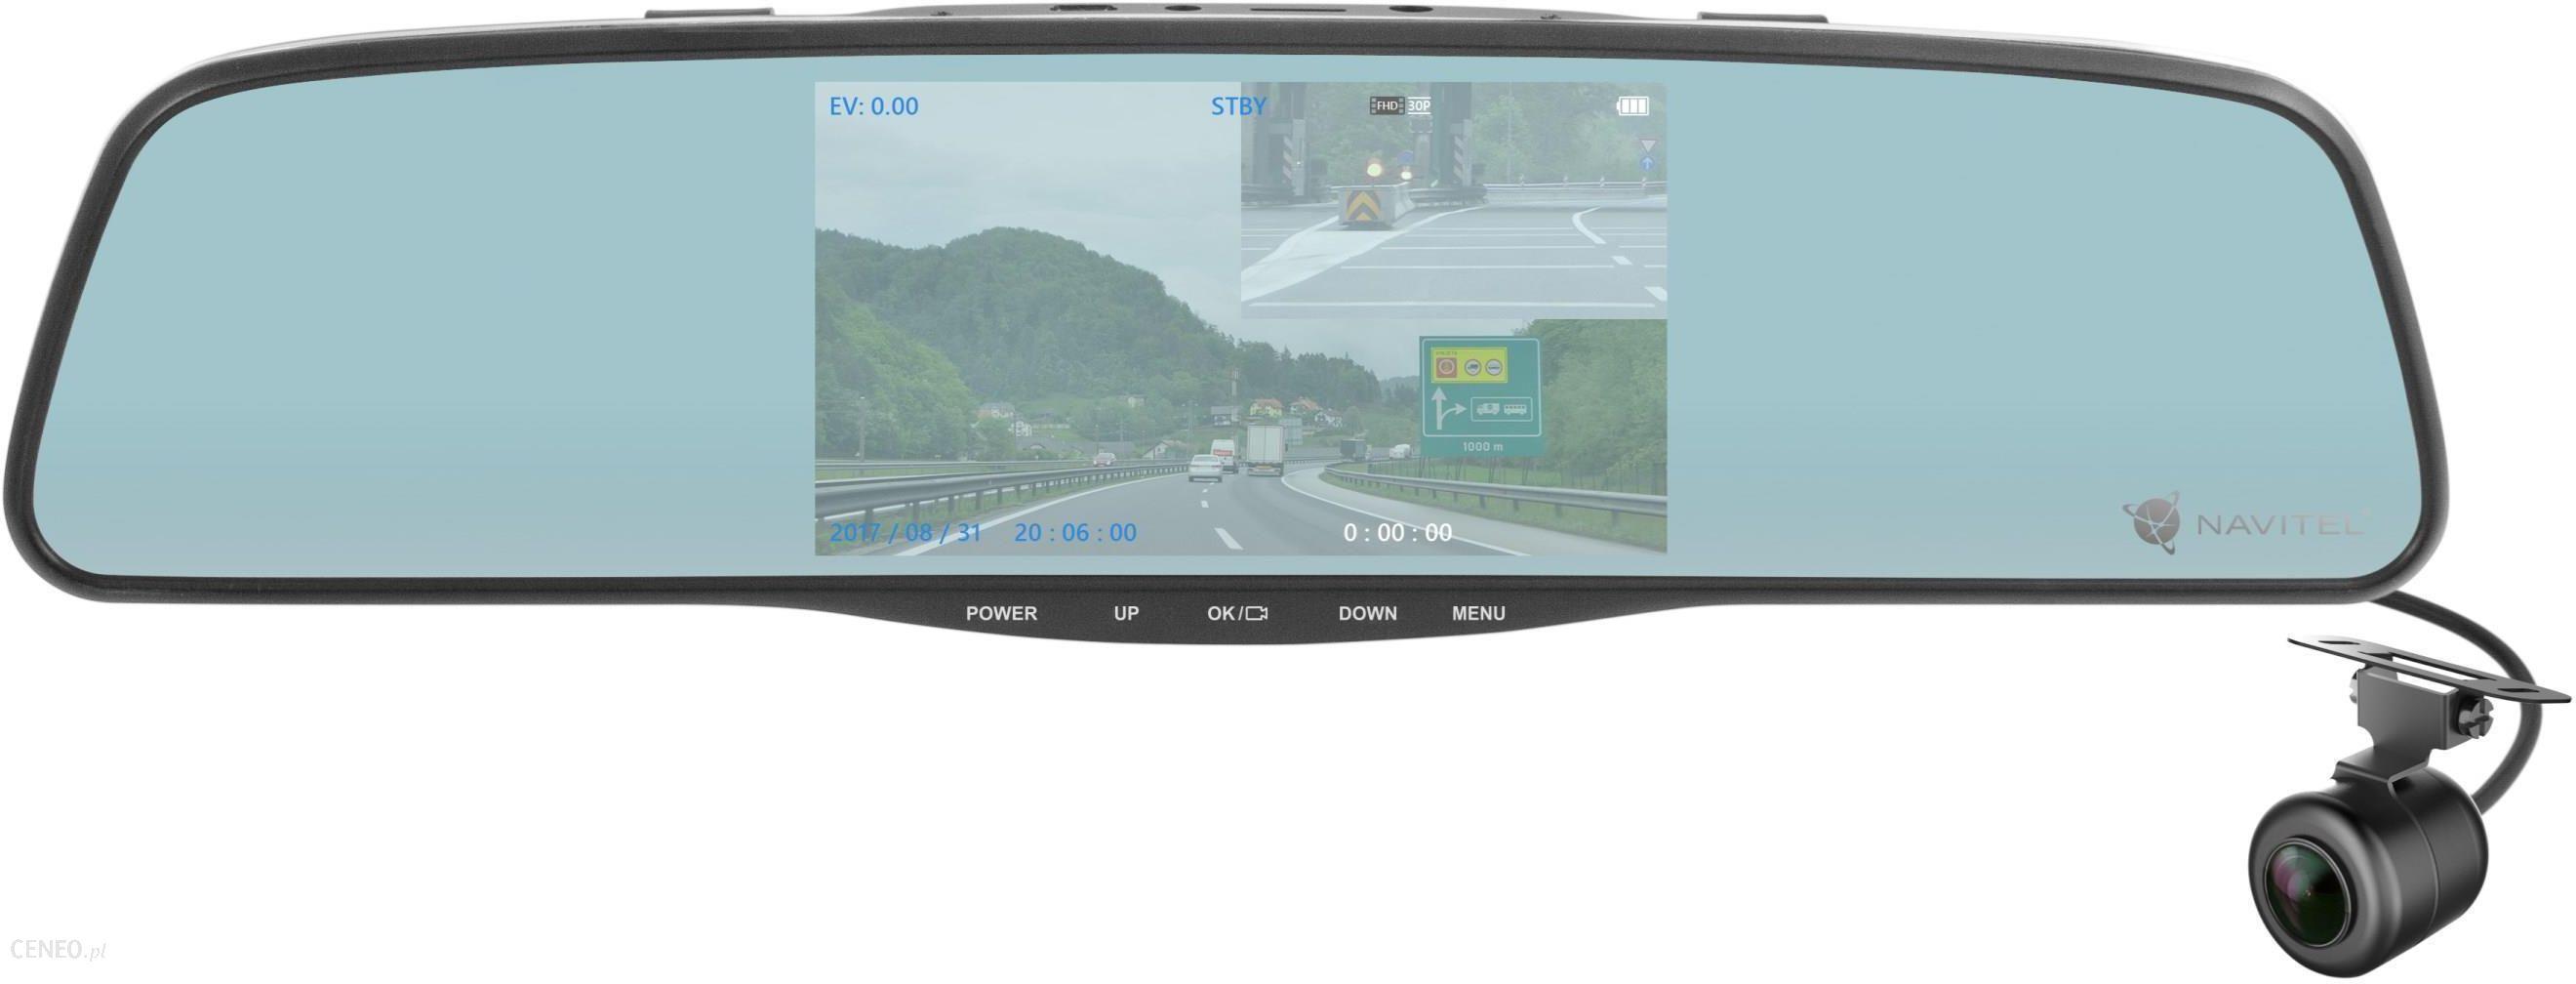 a67ac8d9ae4e1 Rejestrator jazdy Navitel MR250 - Opinie i ceny na Ceneo.pl